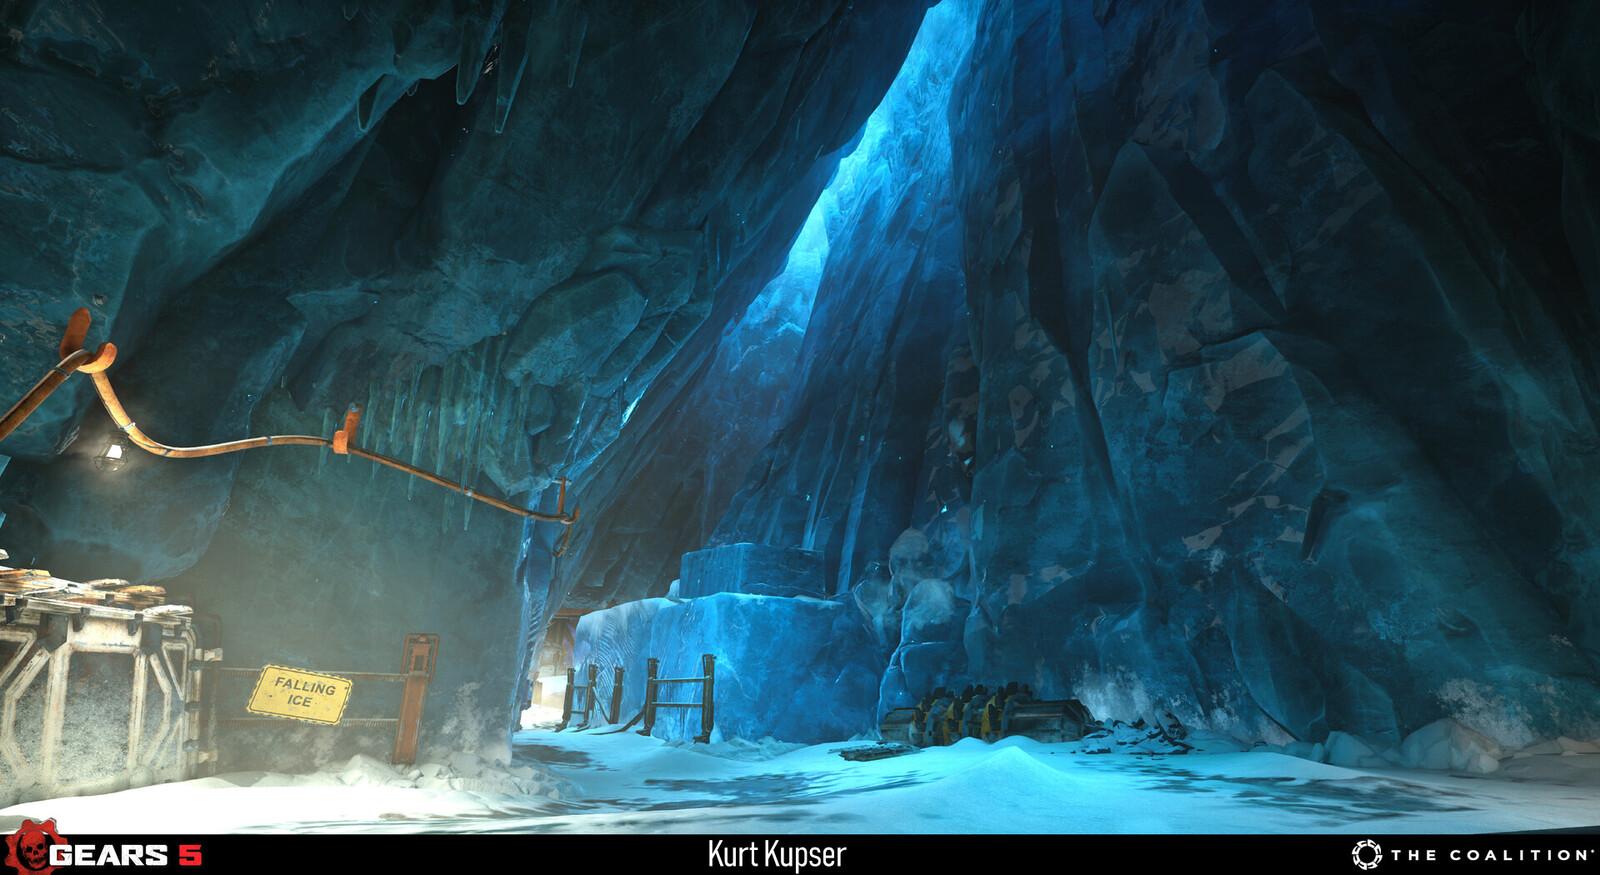 Examples of the ice used in Escape, level art by Boyd McKenzie https://www.artstation.com/dakkon